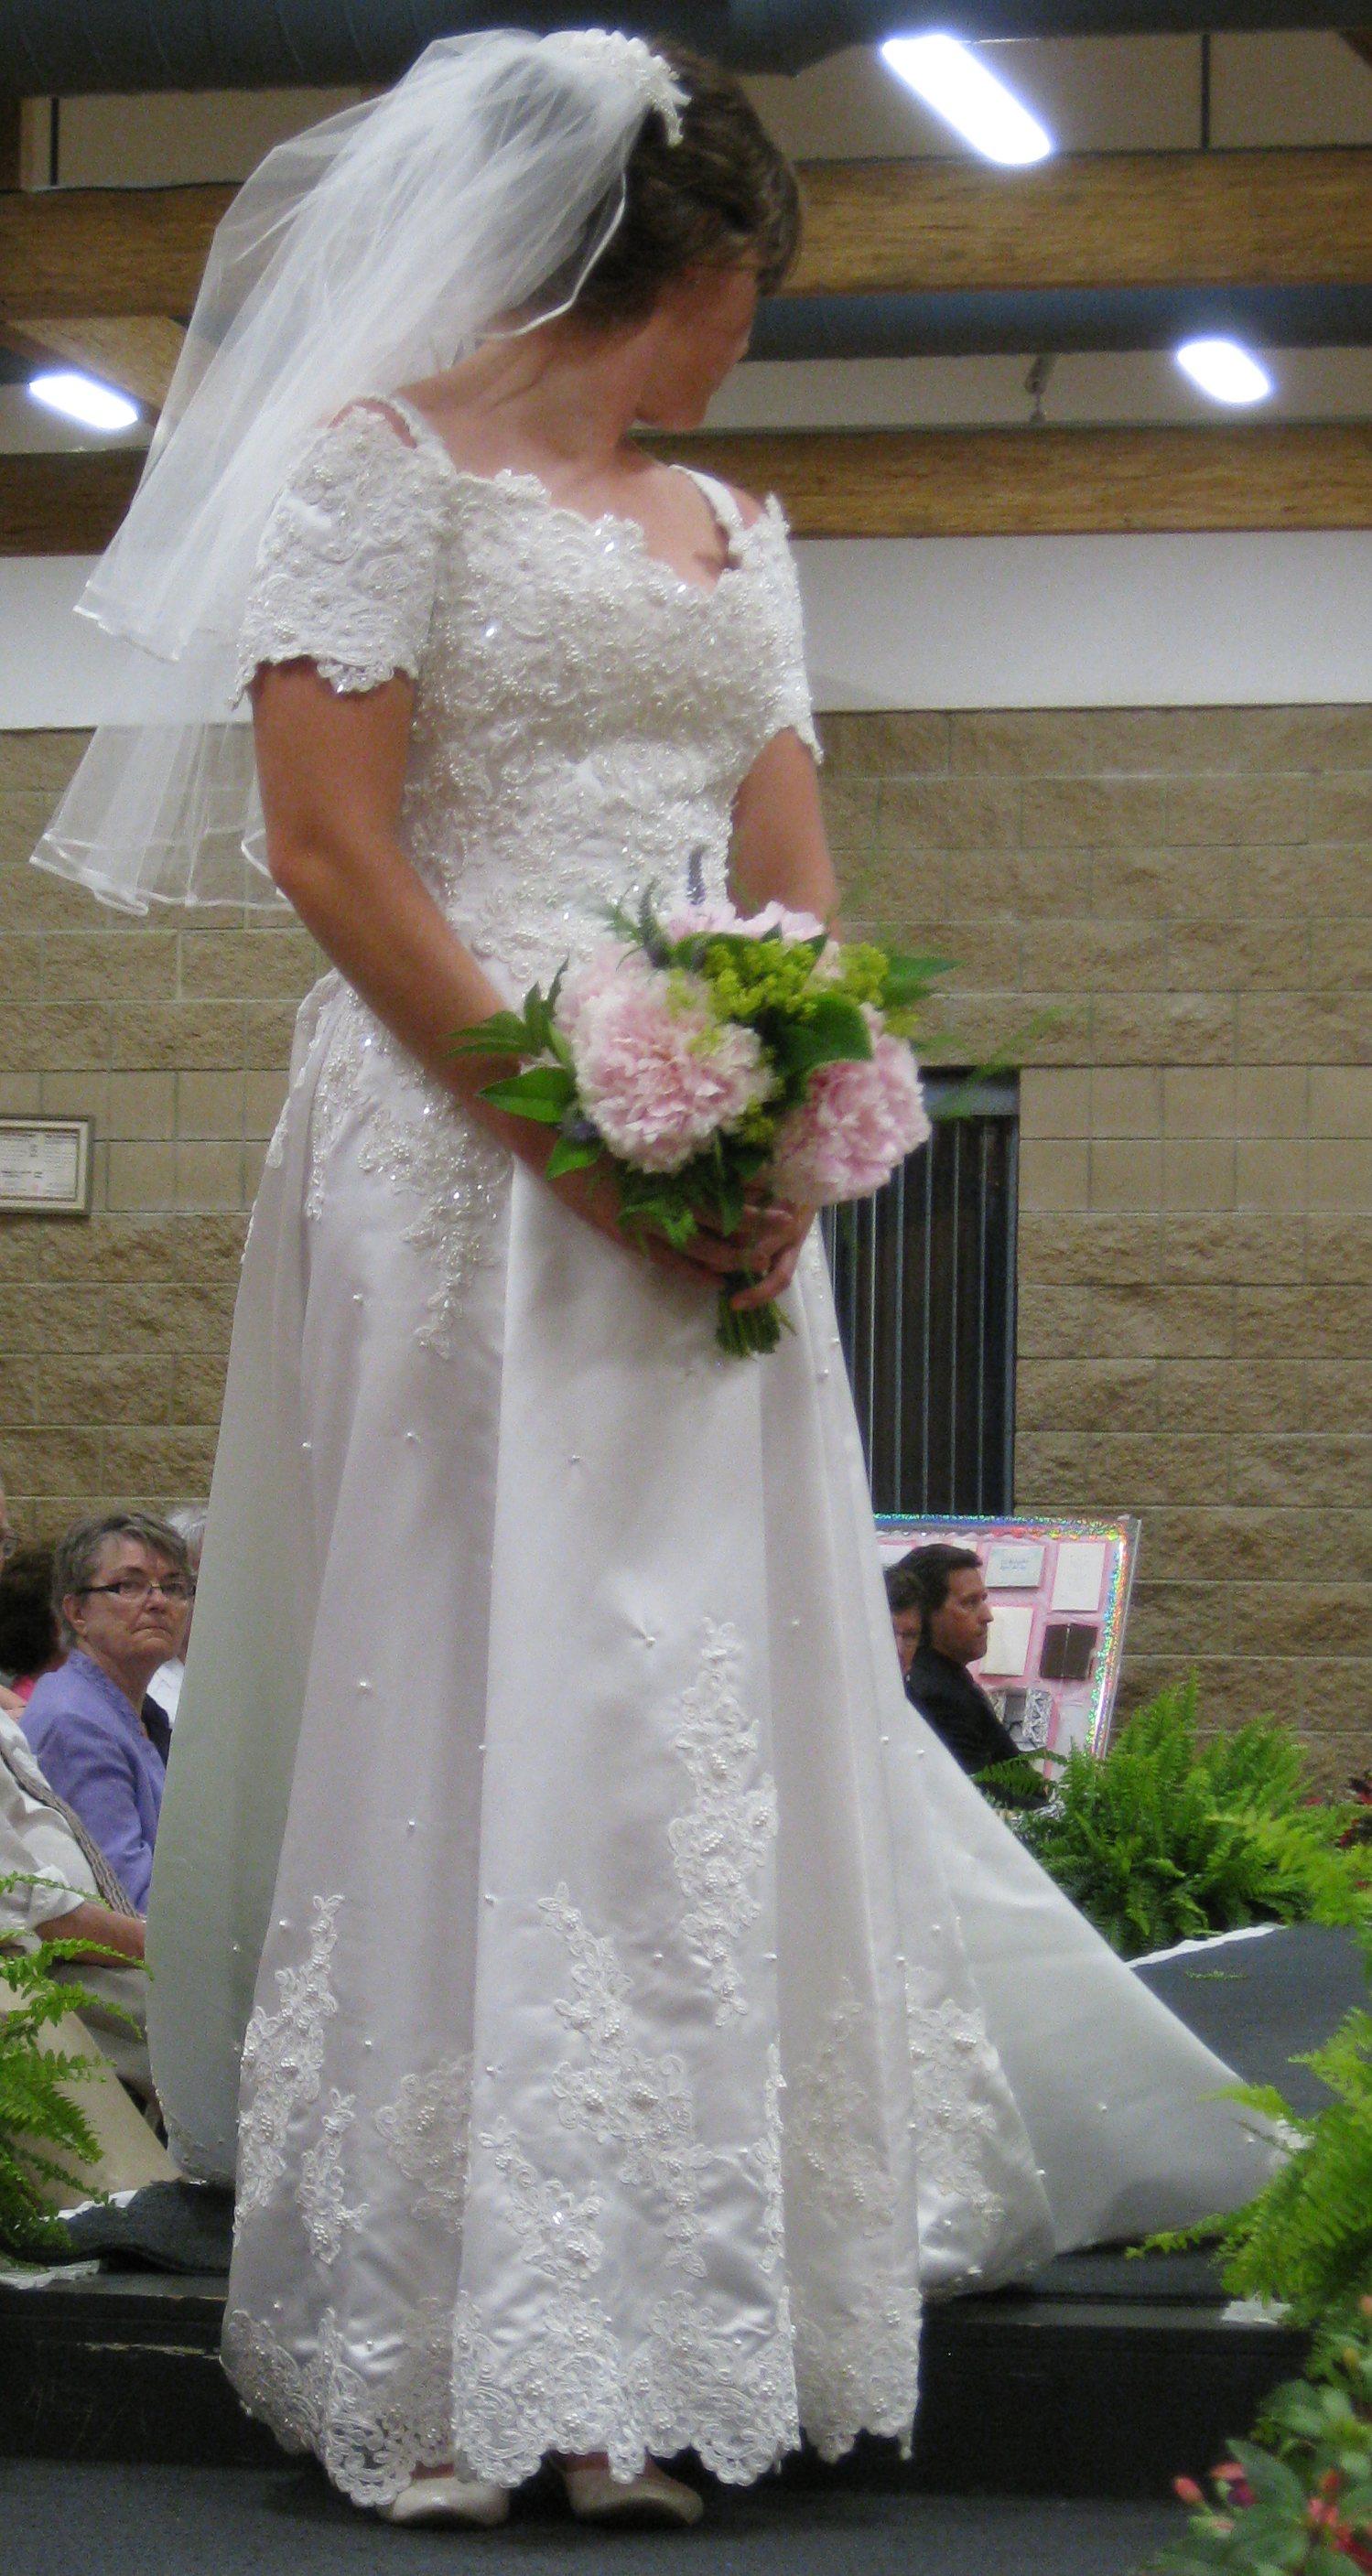 Wedding Dress Fashion MisstoricalFiction